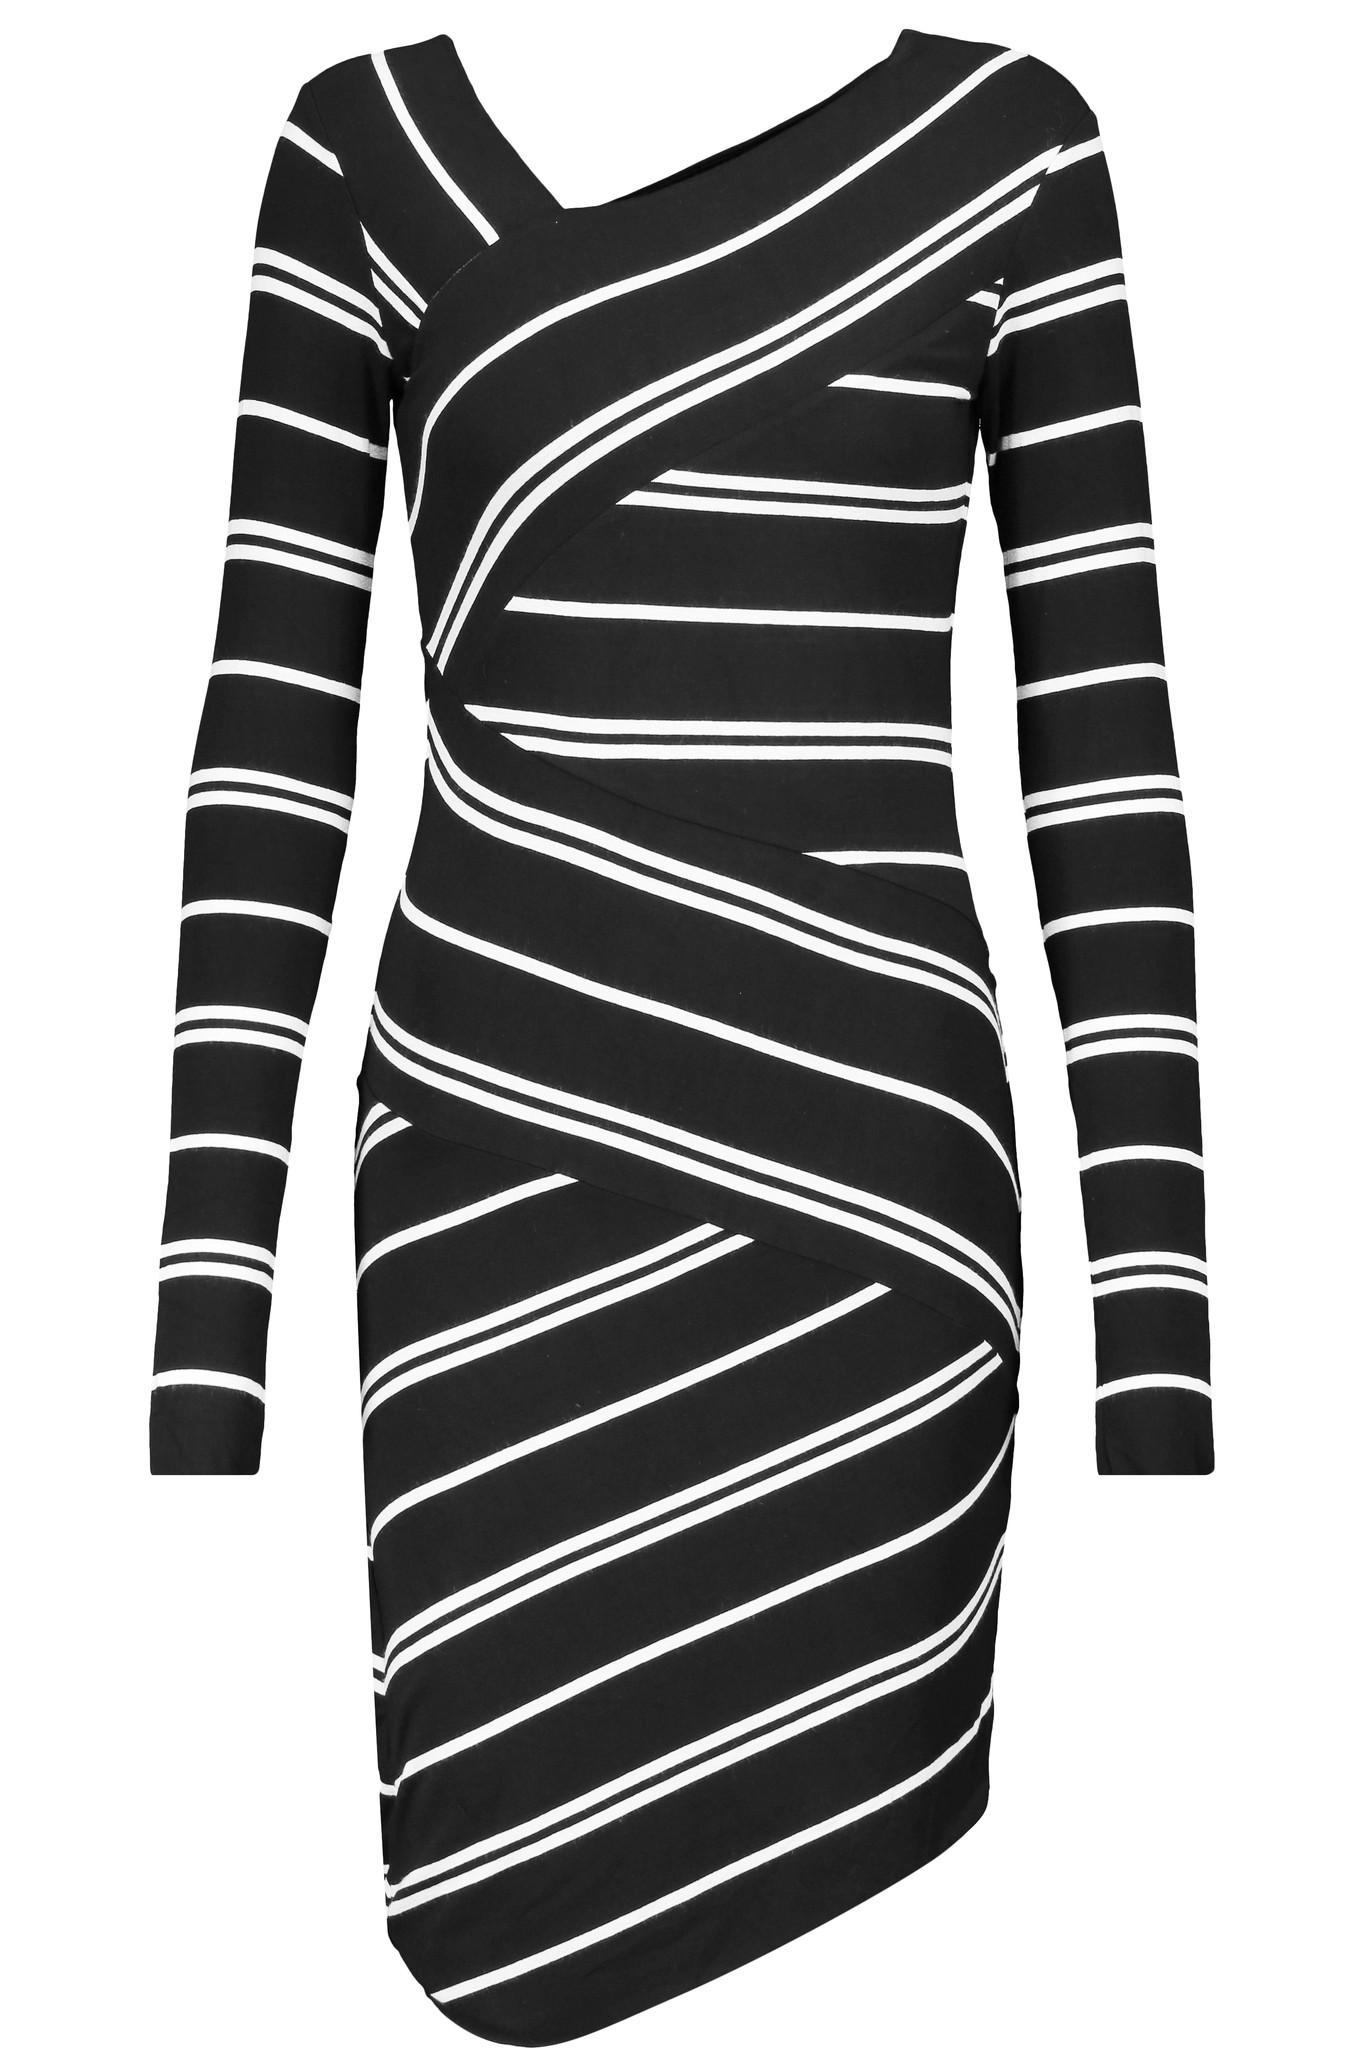 Anthropologie Founder Lyst Bailey 44 Striped Stretch Jersey Dress In Black